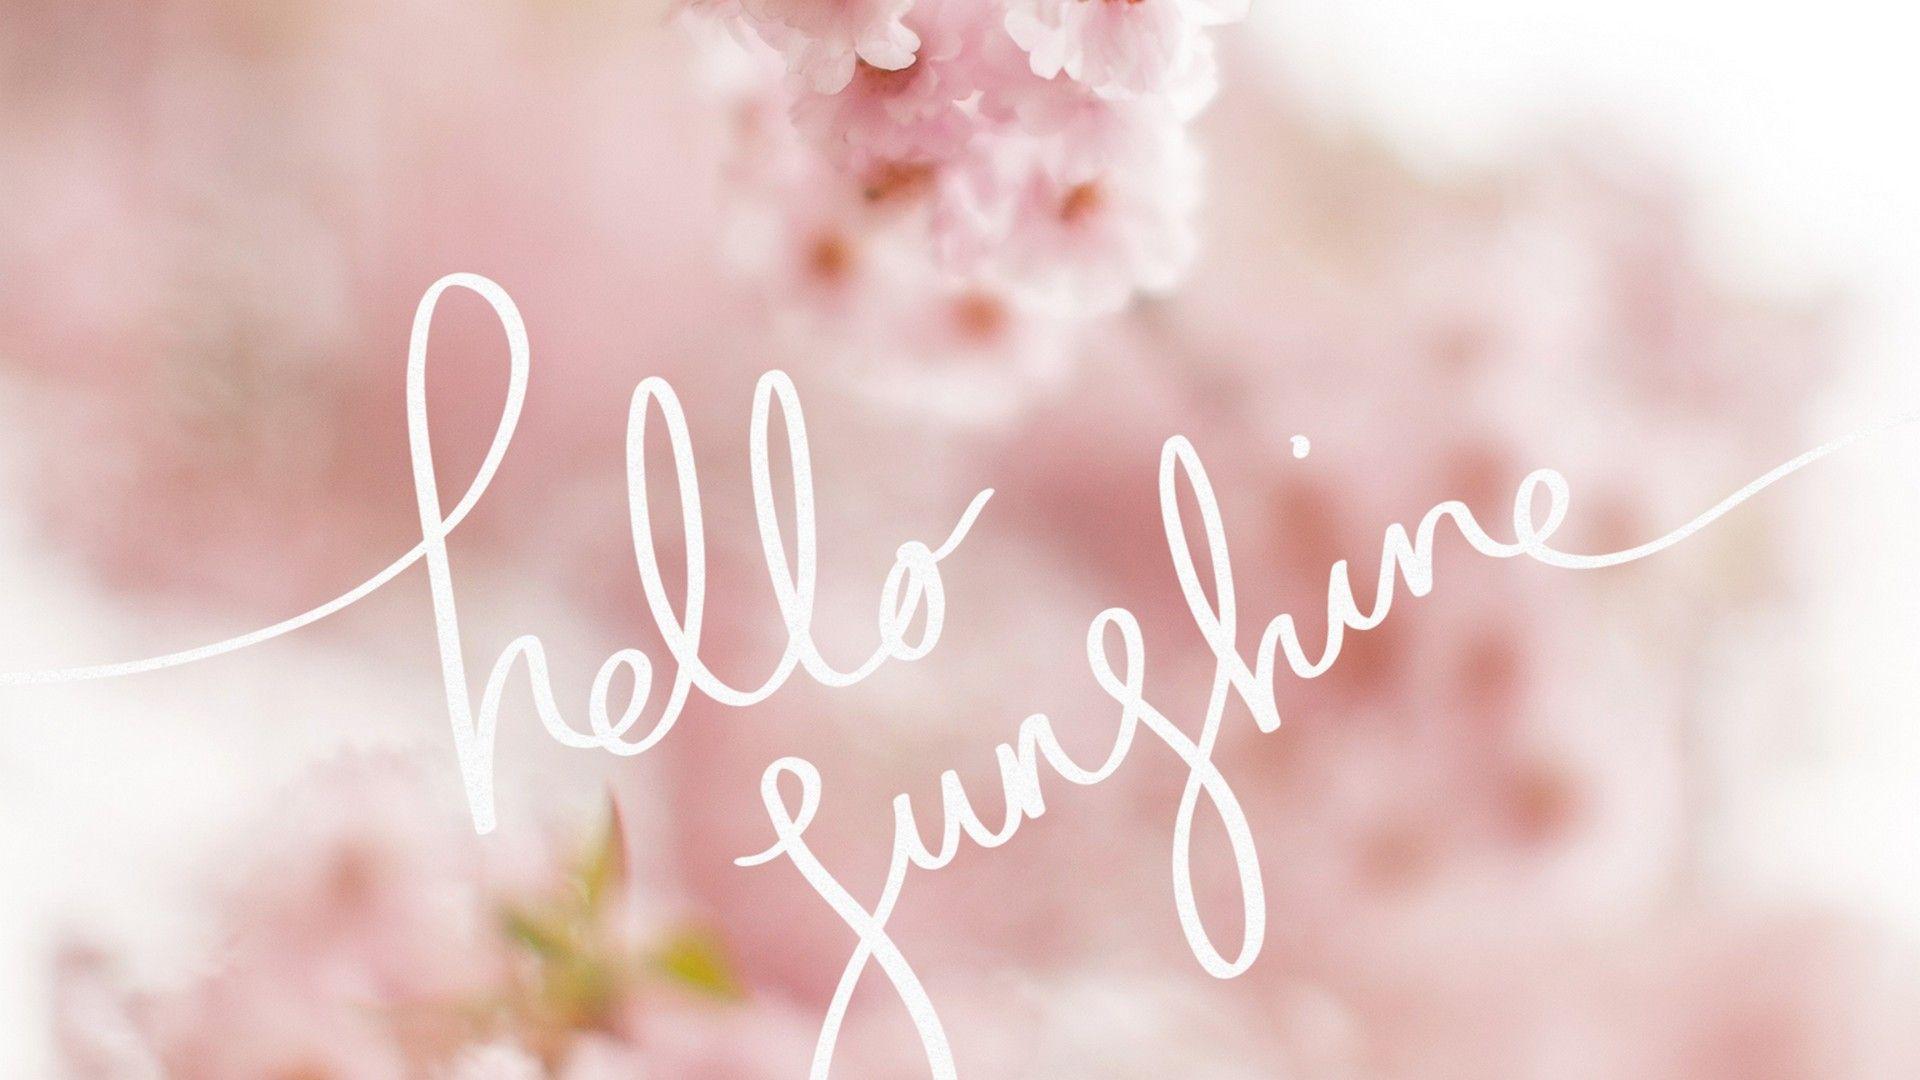 Cute Spring Backgrounds For Desktop - HD Wallpaper